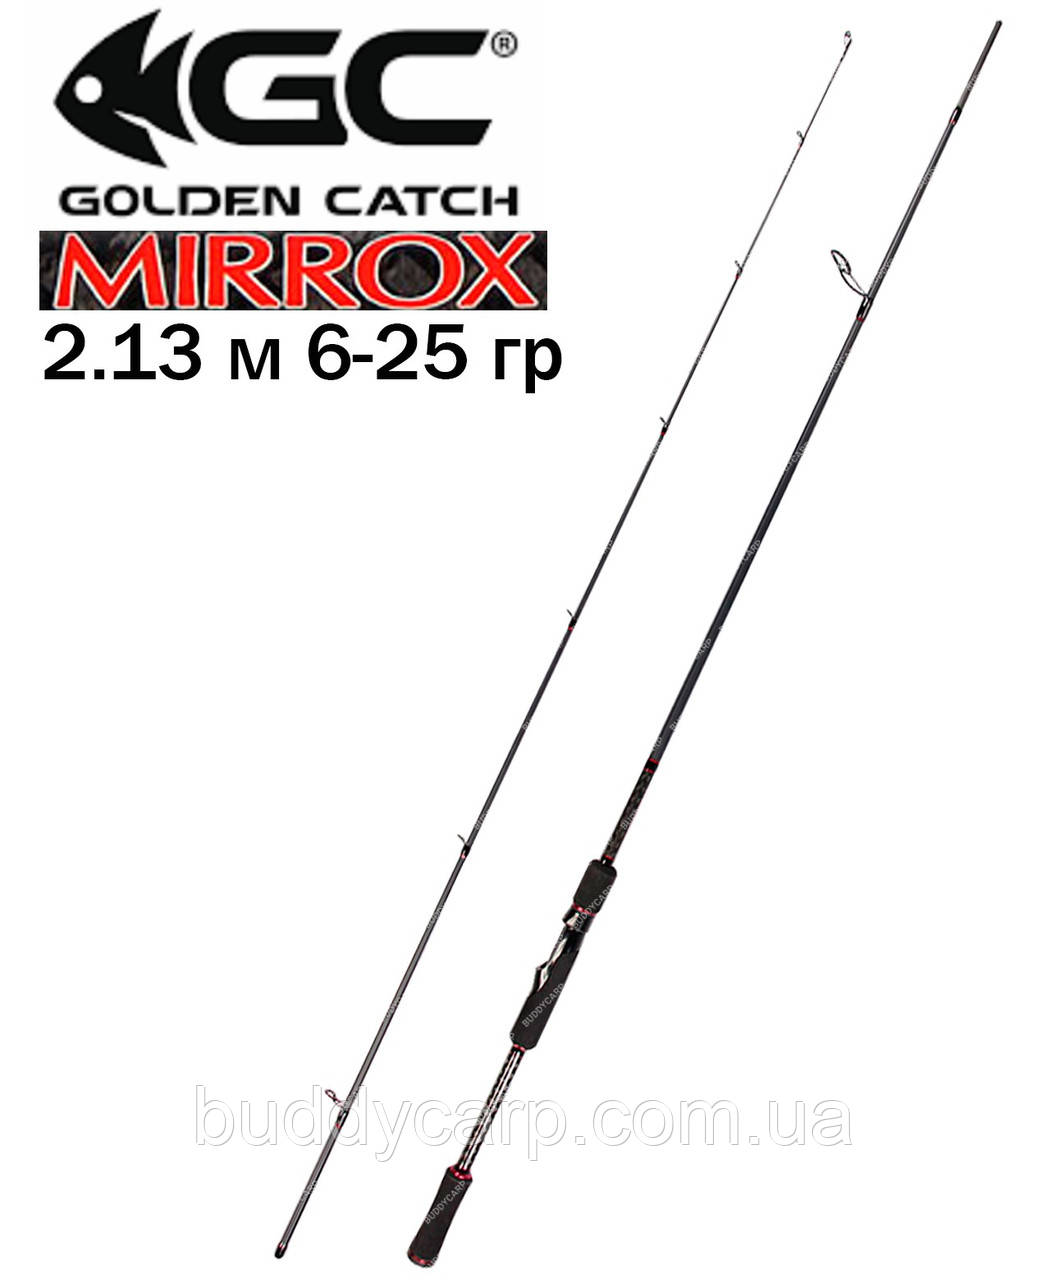 Спиннинг GC Mirrox 2.13 м 6-25 гр MRS-702M